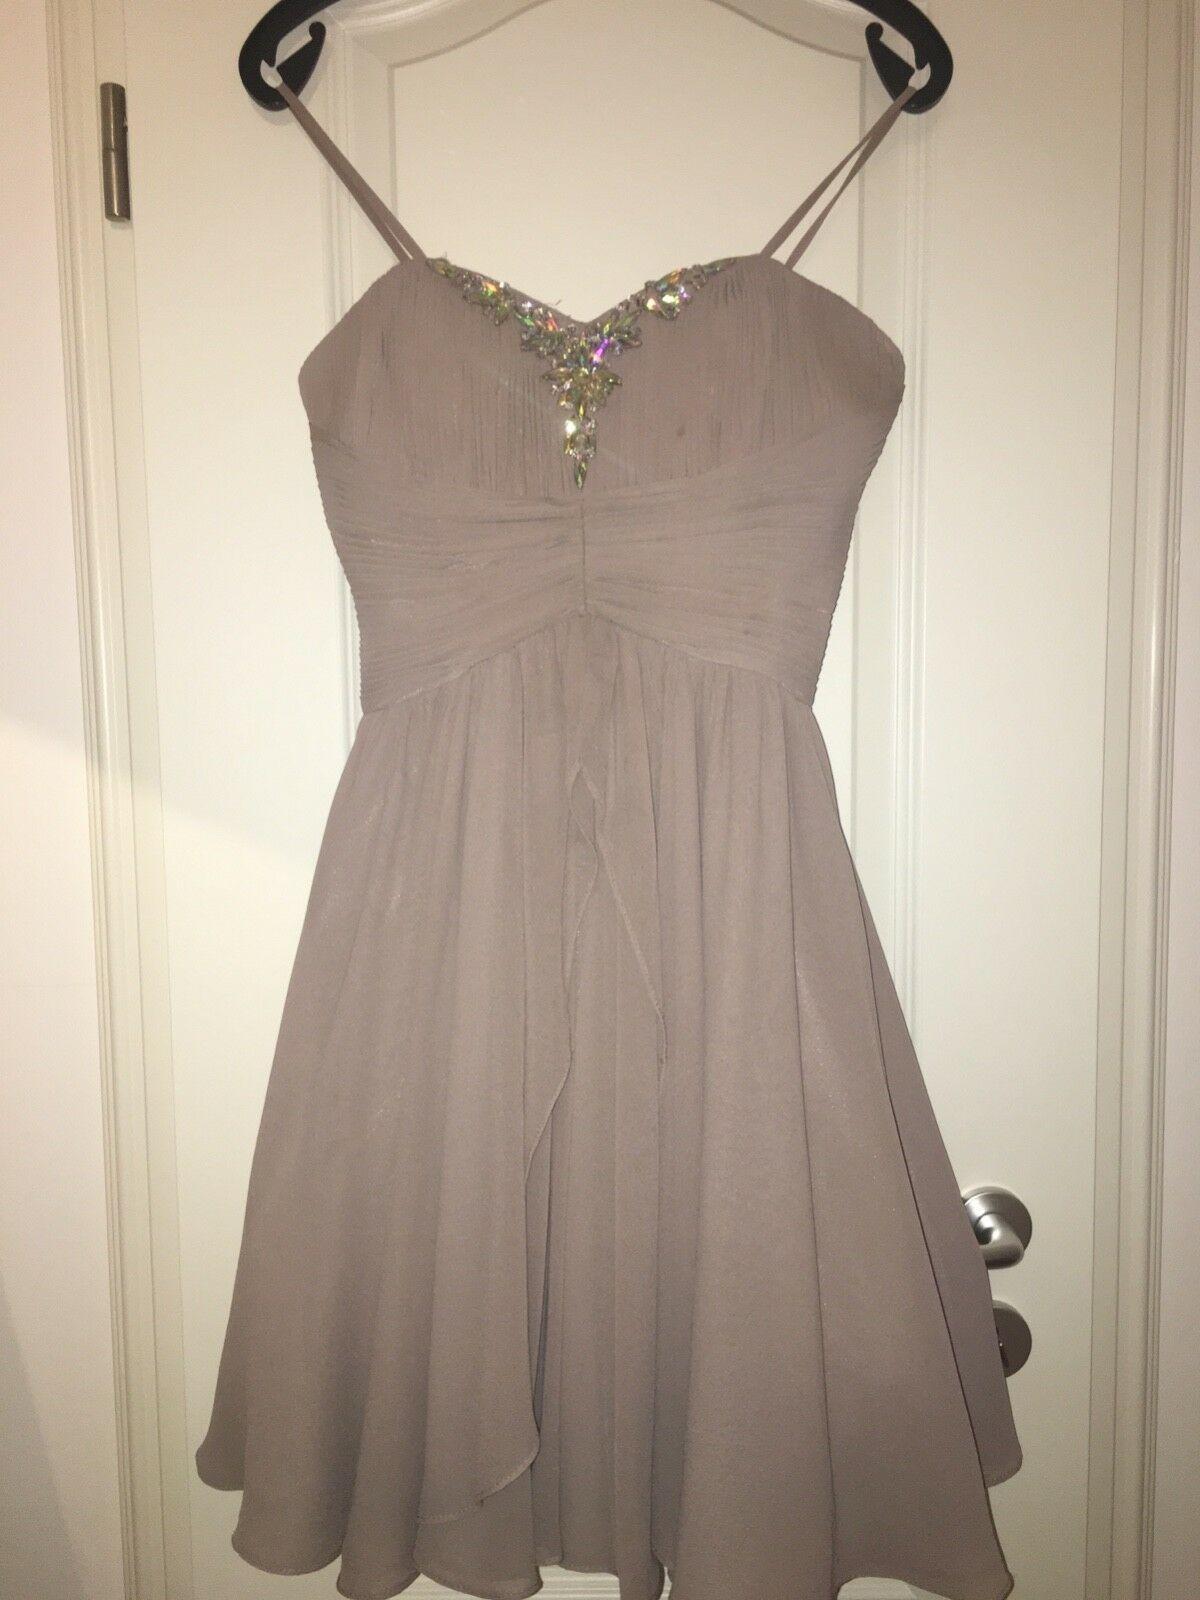 Elegantes Abendkleid Gr 36 Elegante Abendkleider Abendkleid Elegante Kleider